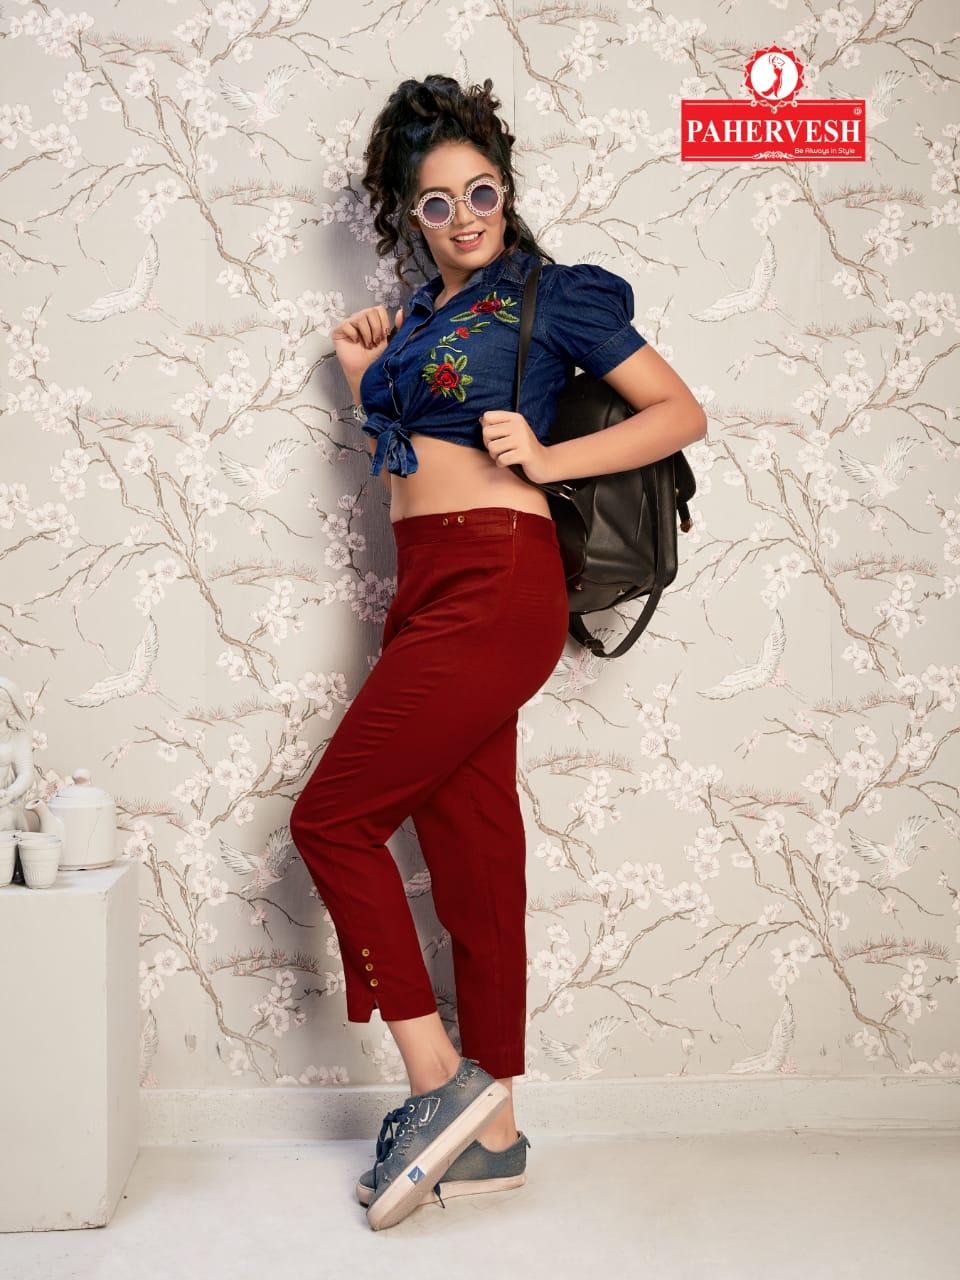 Pahervesh venus Fancy collection of flax Pants